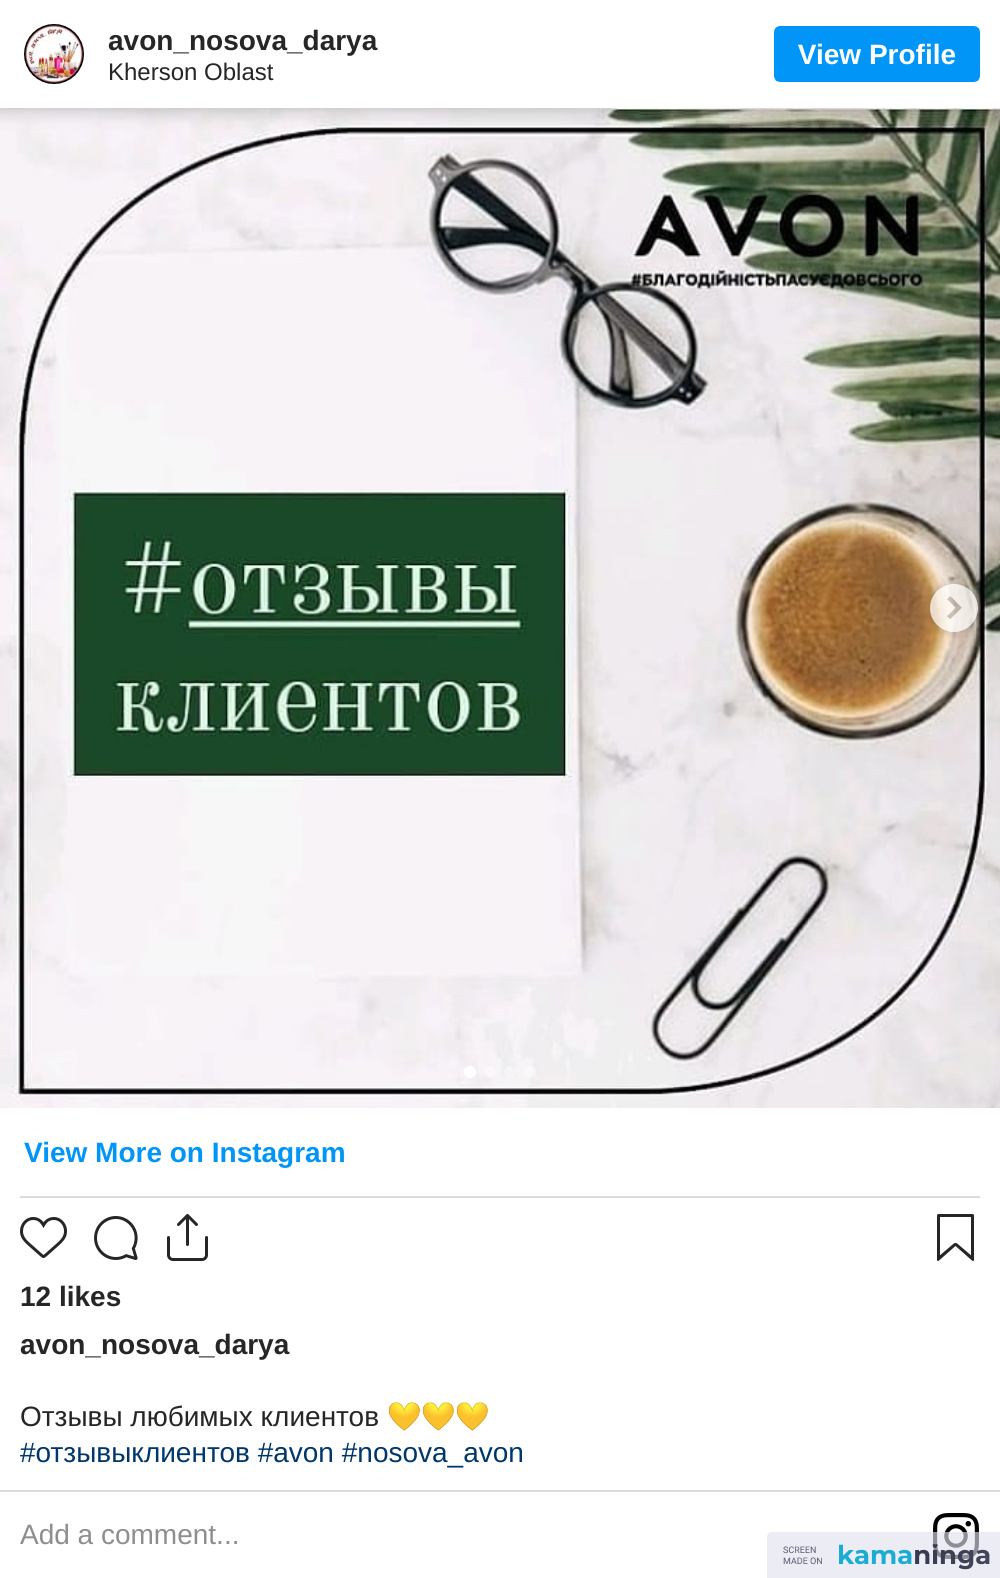 https://www.instagram.com/p/CQy4tBPh2NQ/